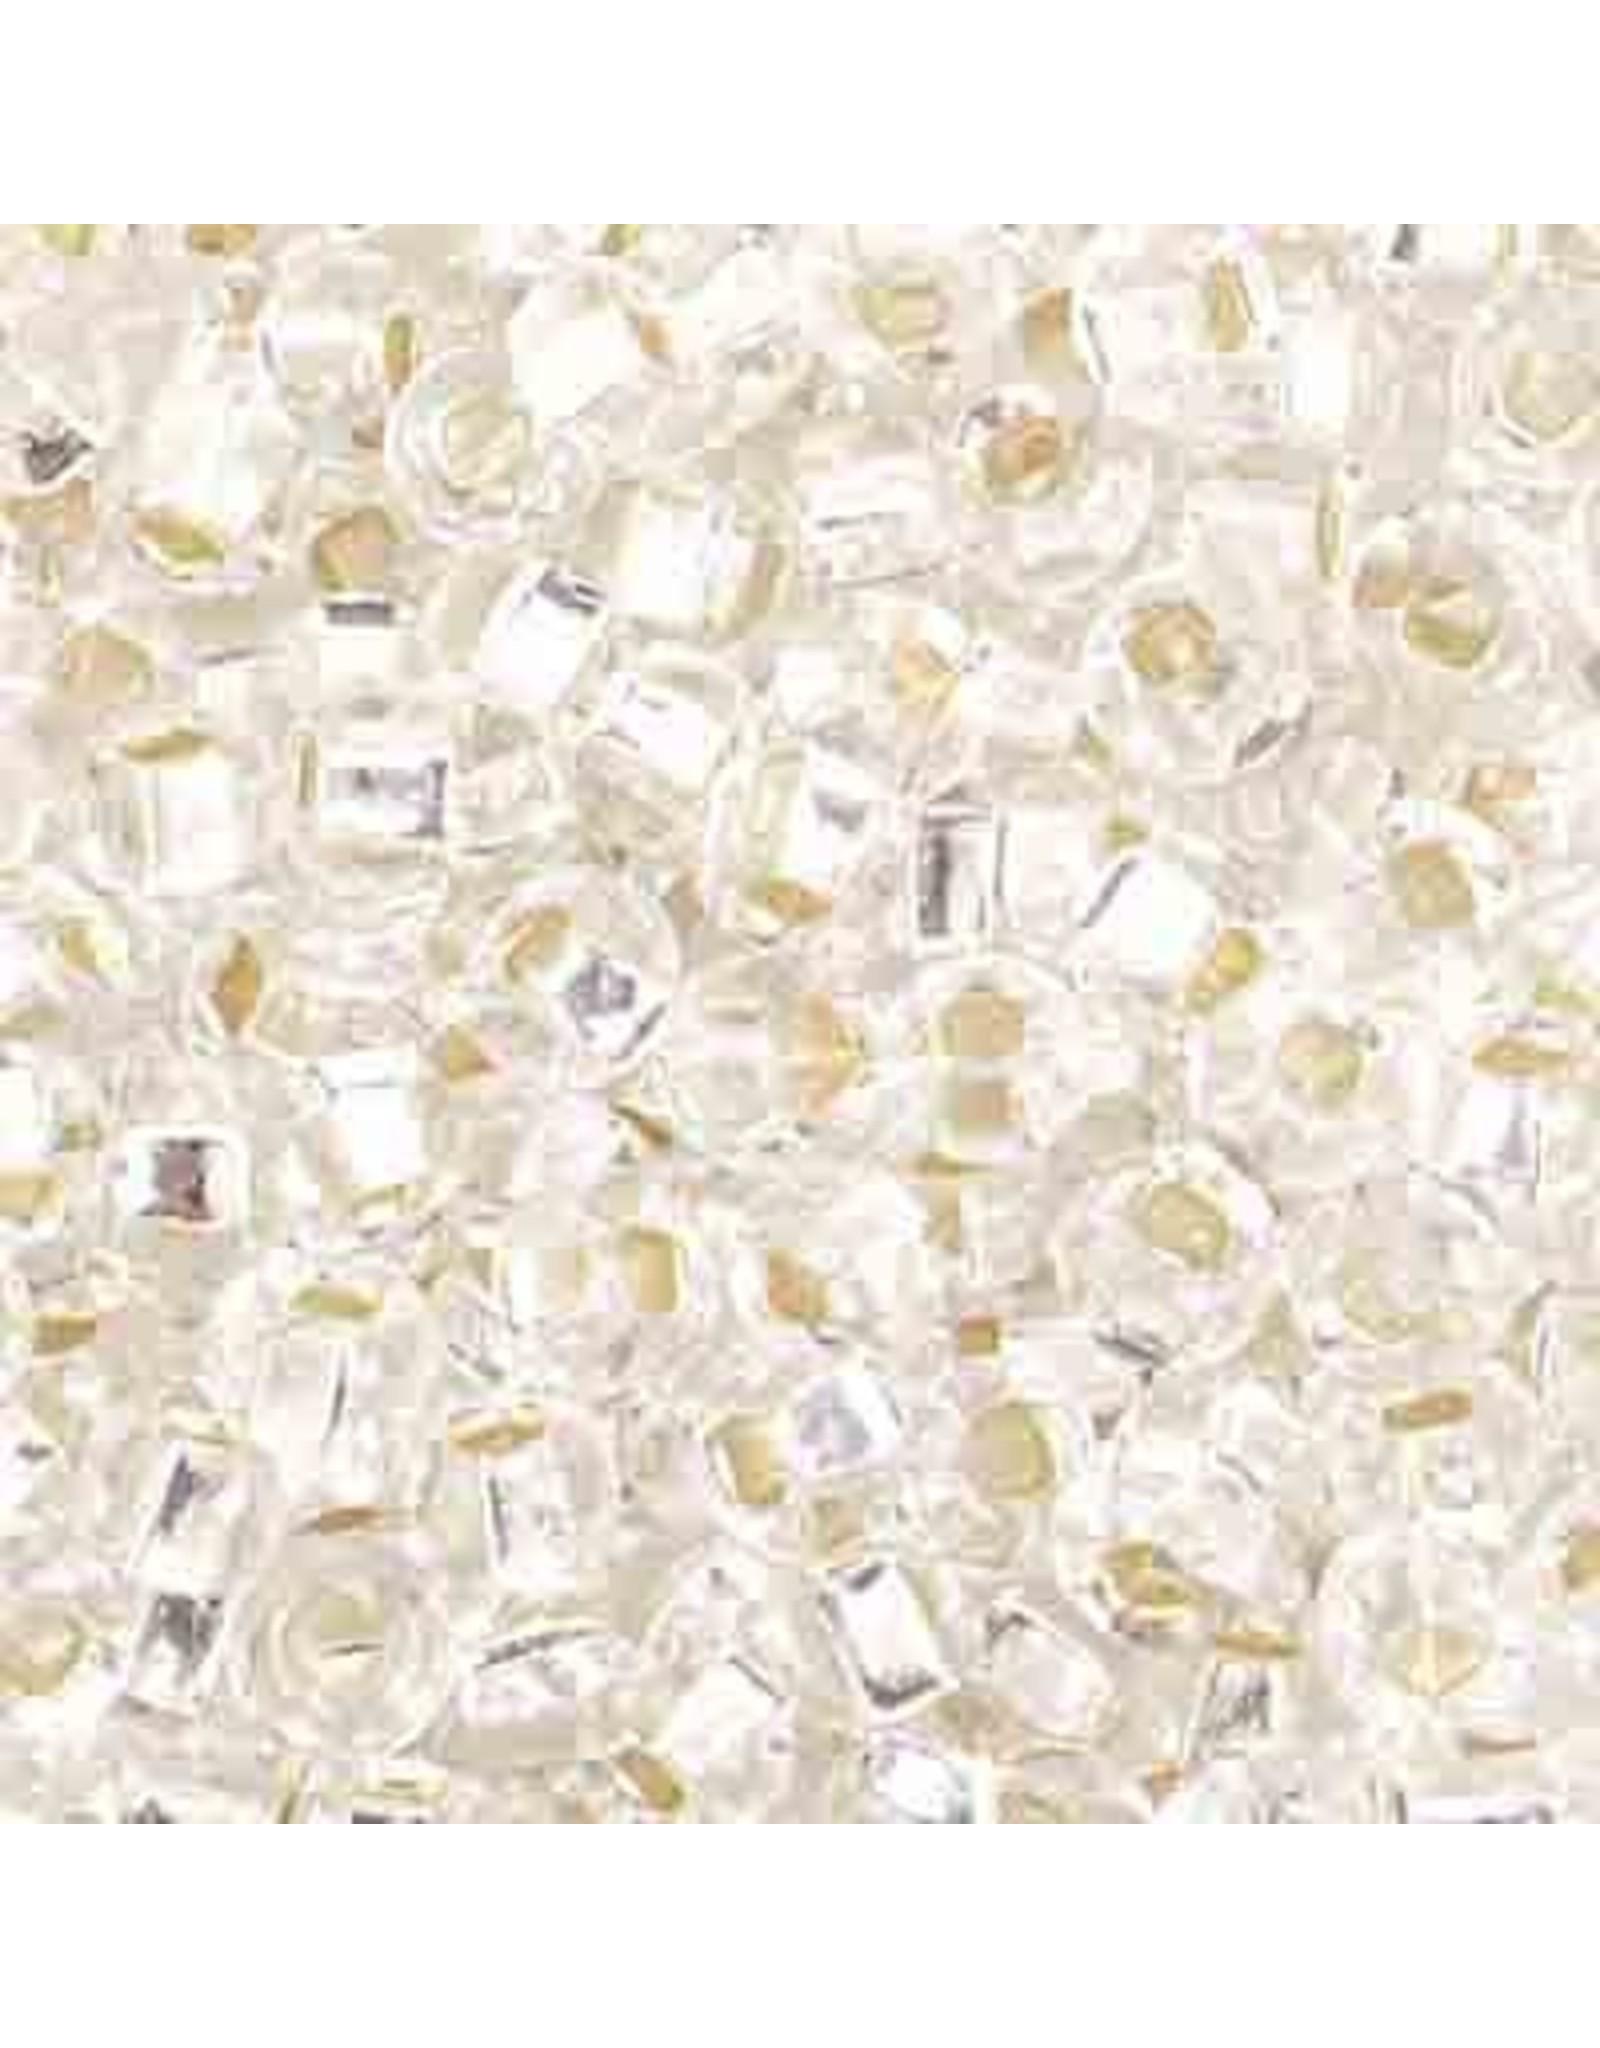 Czech 401680B 6   Seed 250g Clear s/l